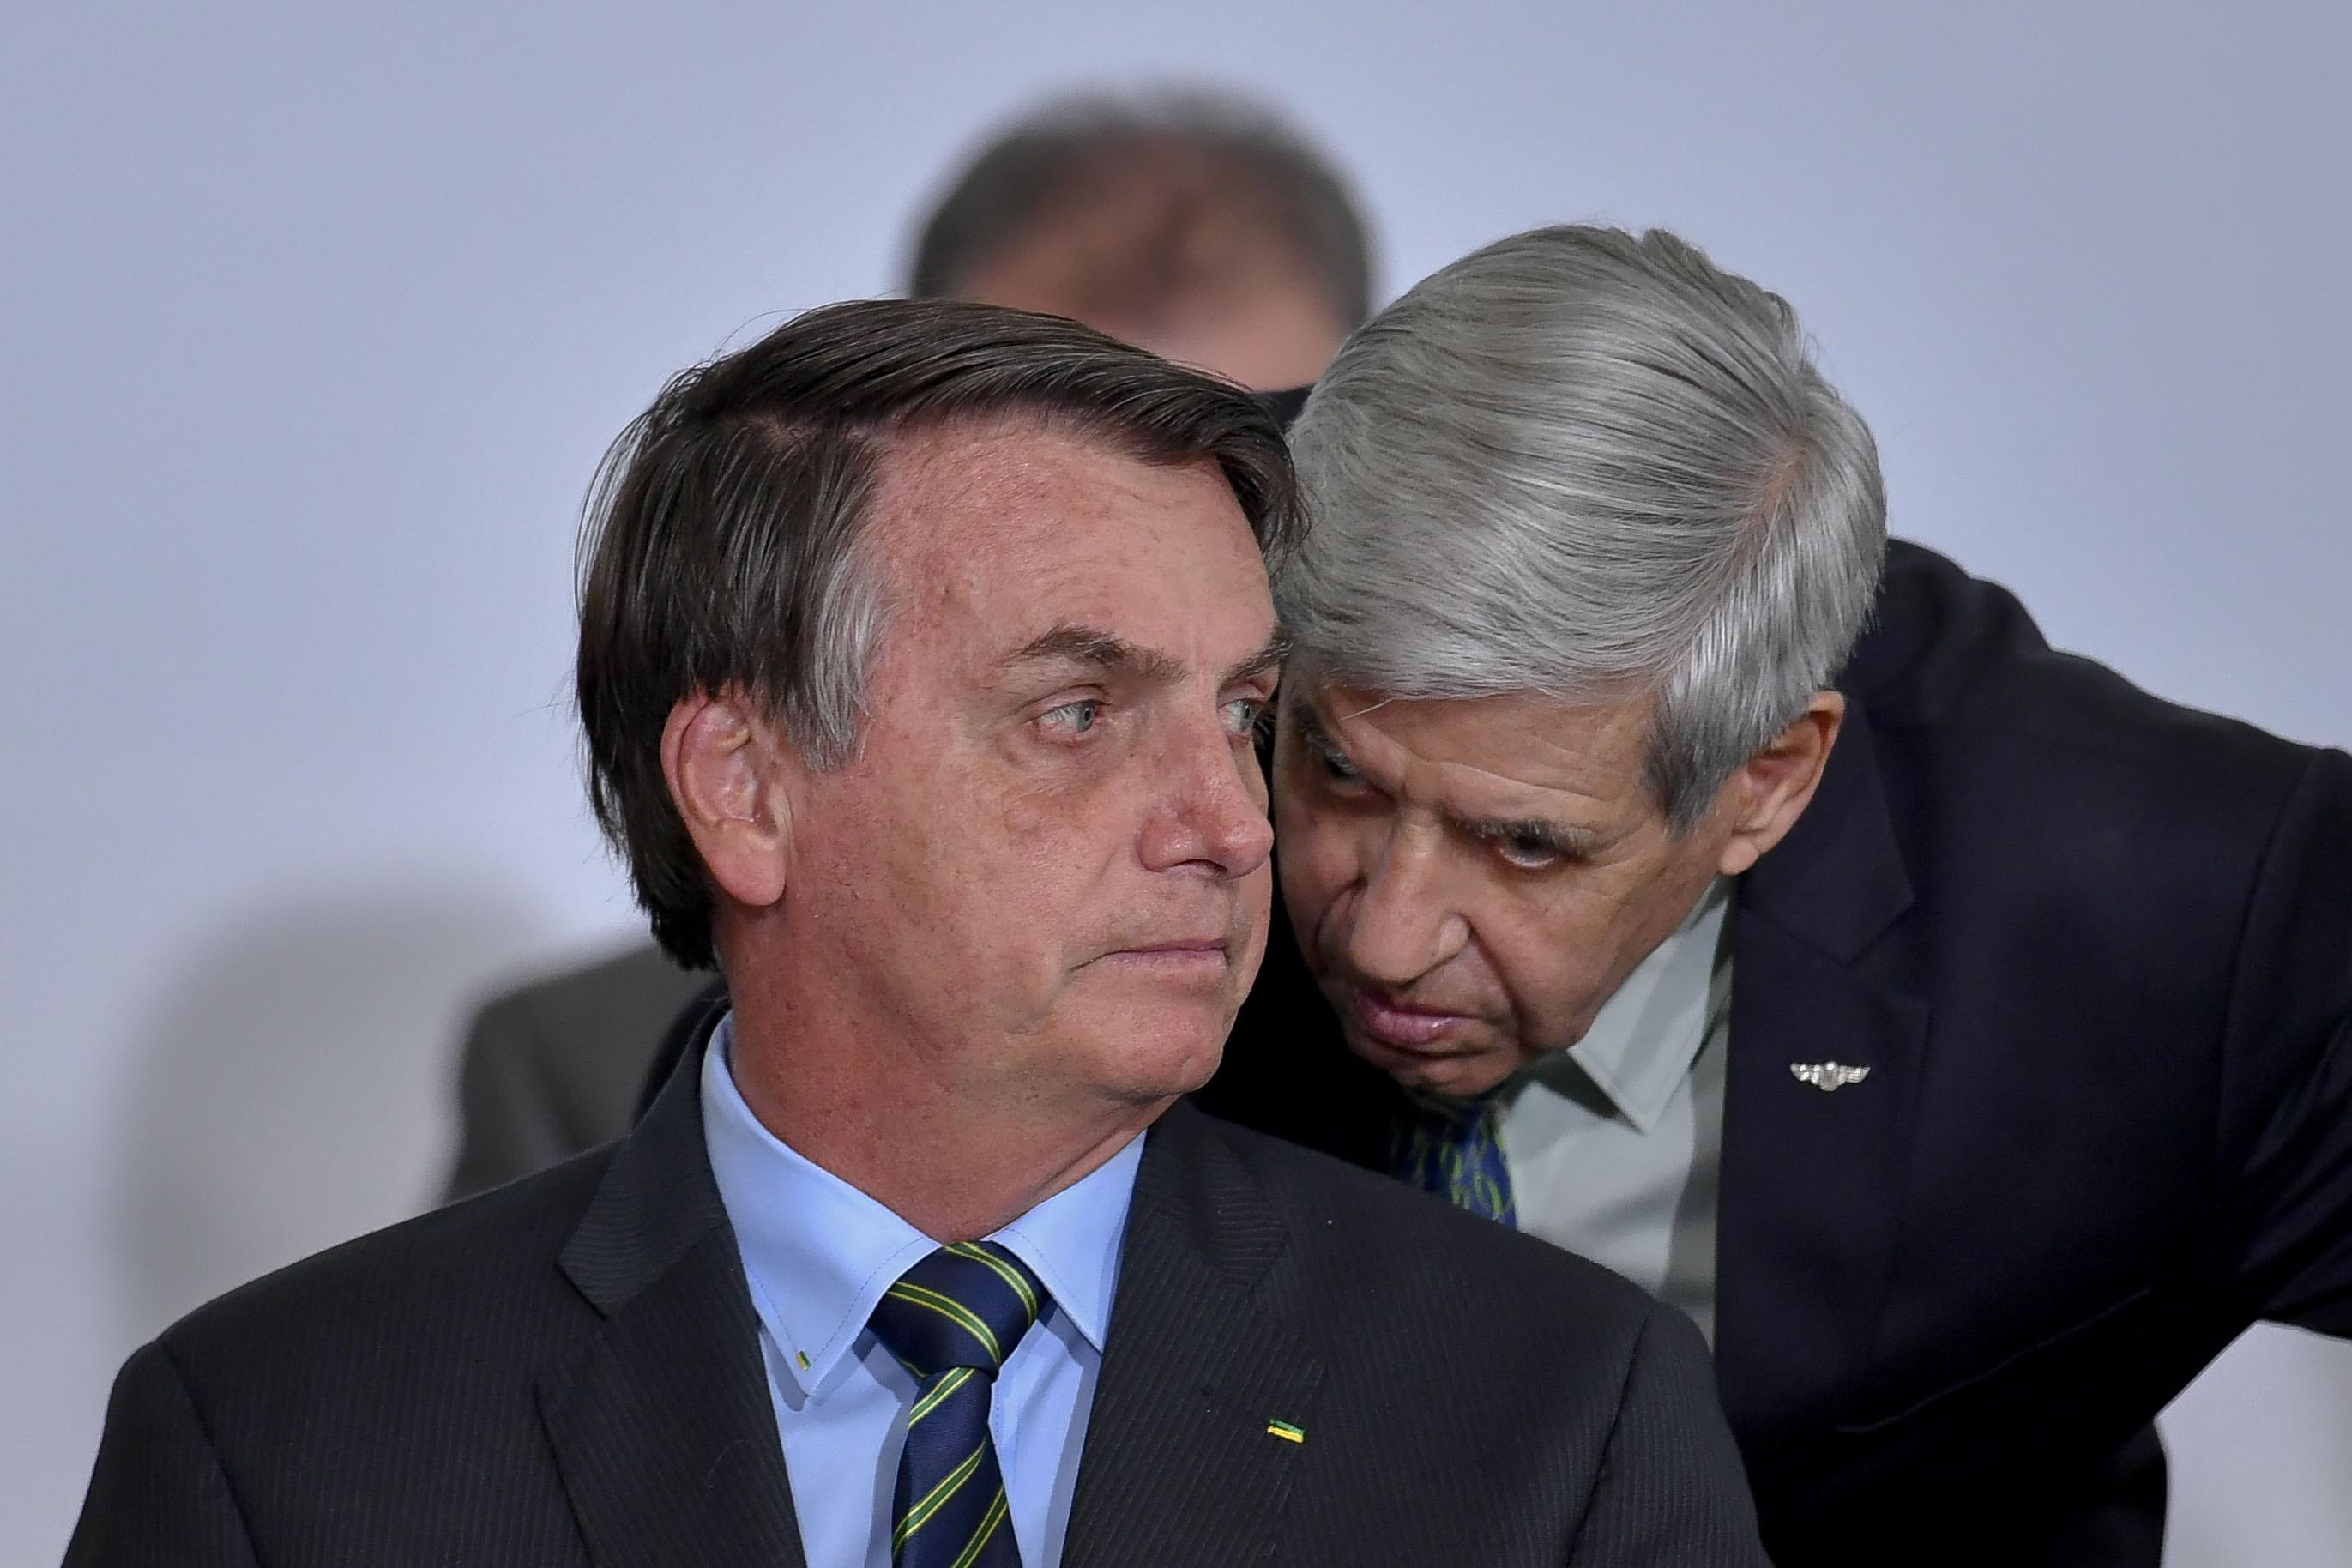 O presidente Jair Bolsonaro conversa com Augusto Heleno, ministro do GSI.